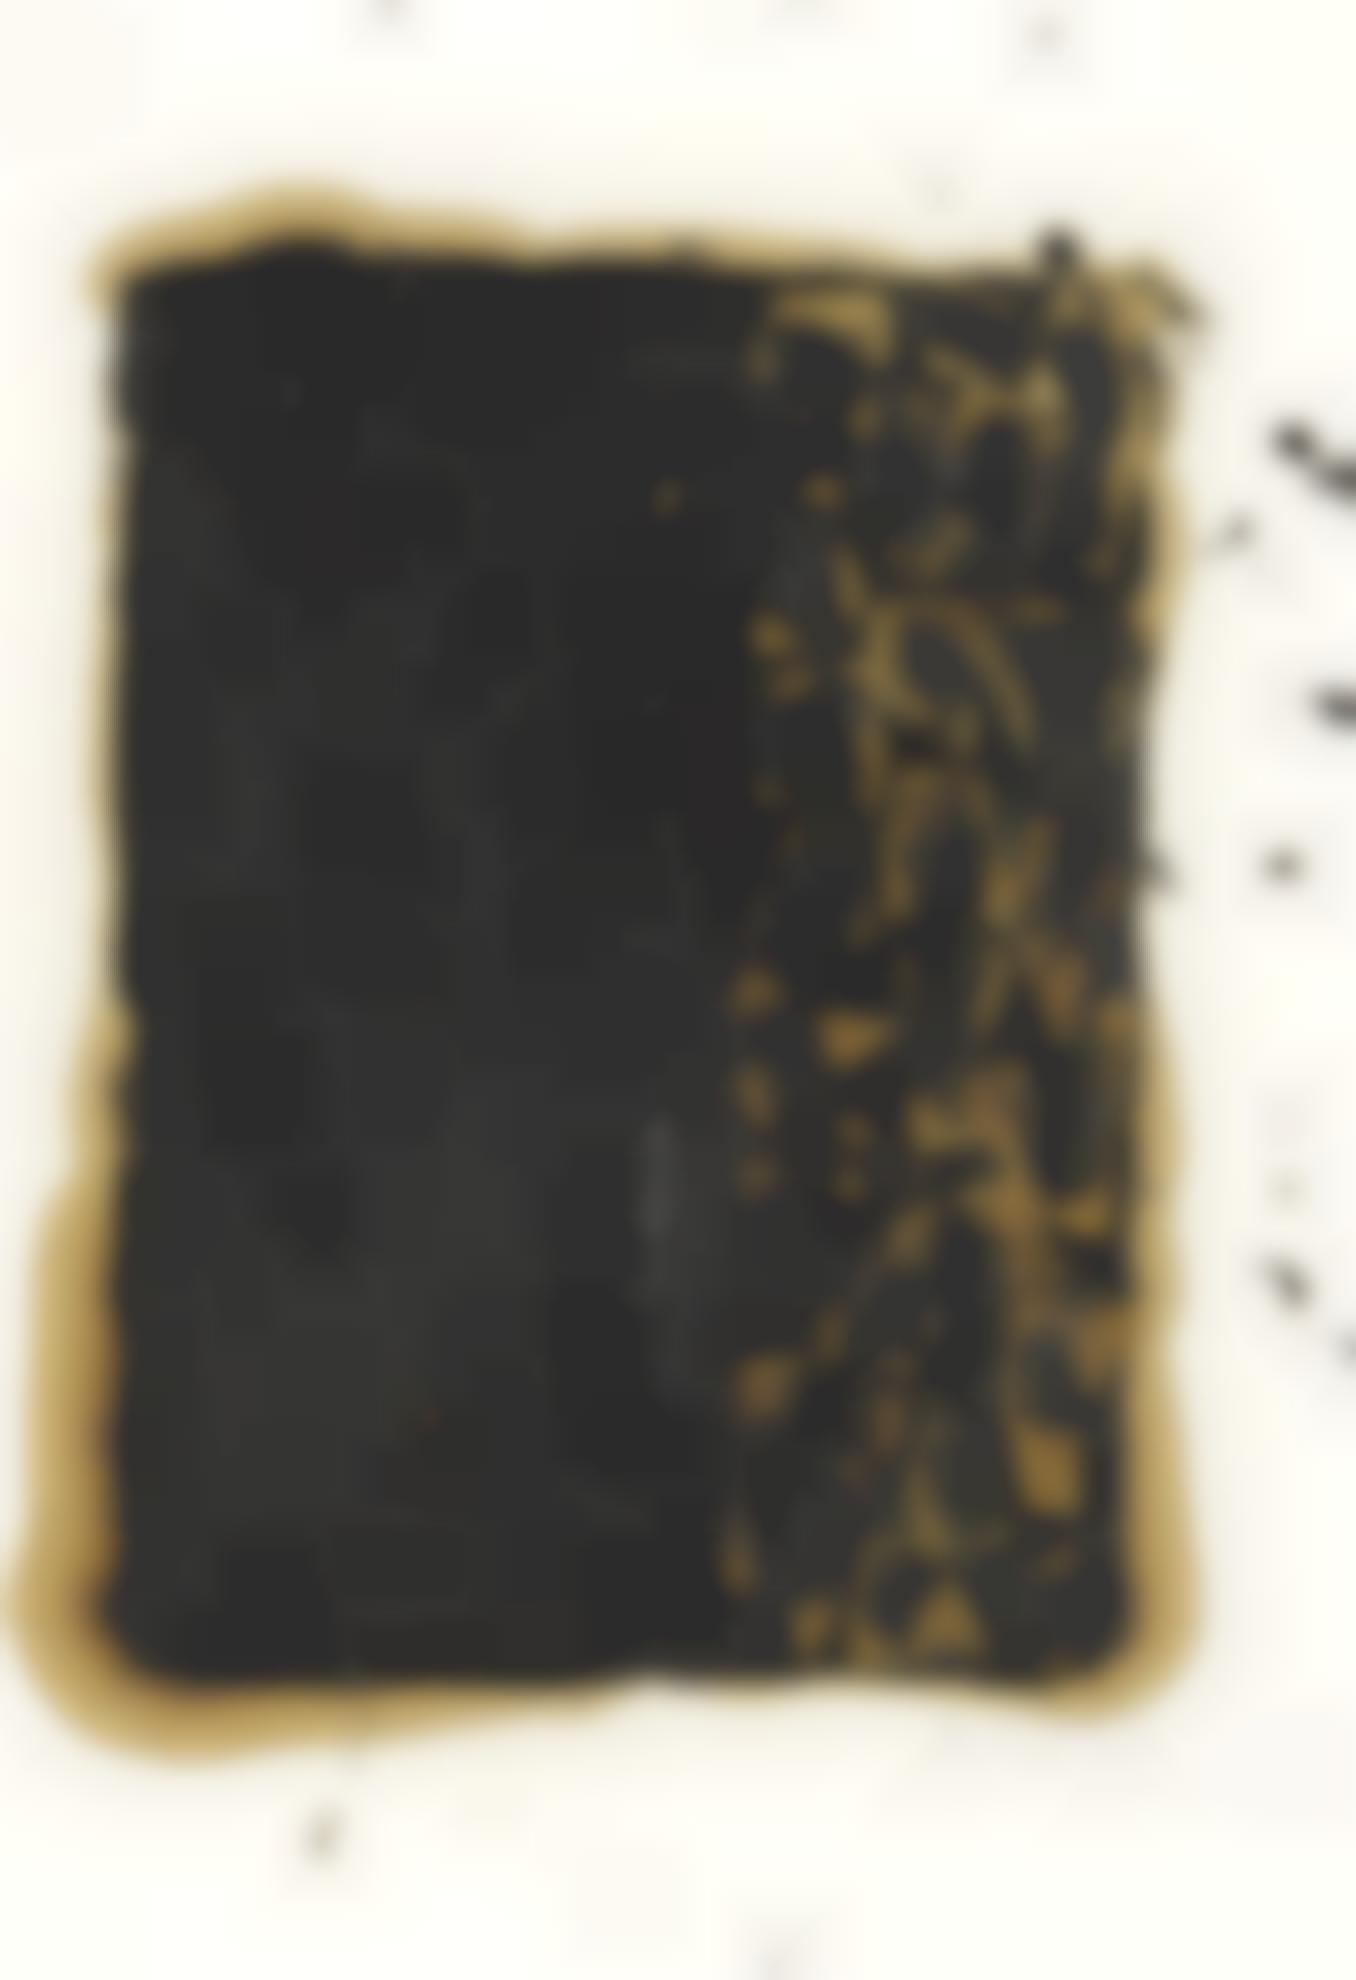 Jannis Kounellis-Untitled-1985